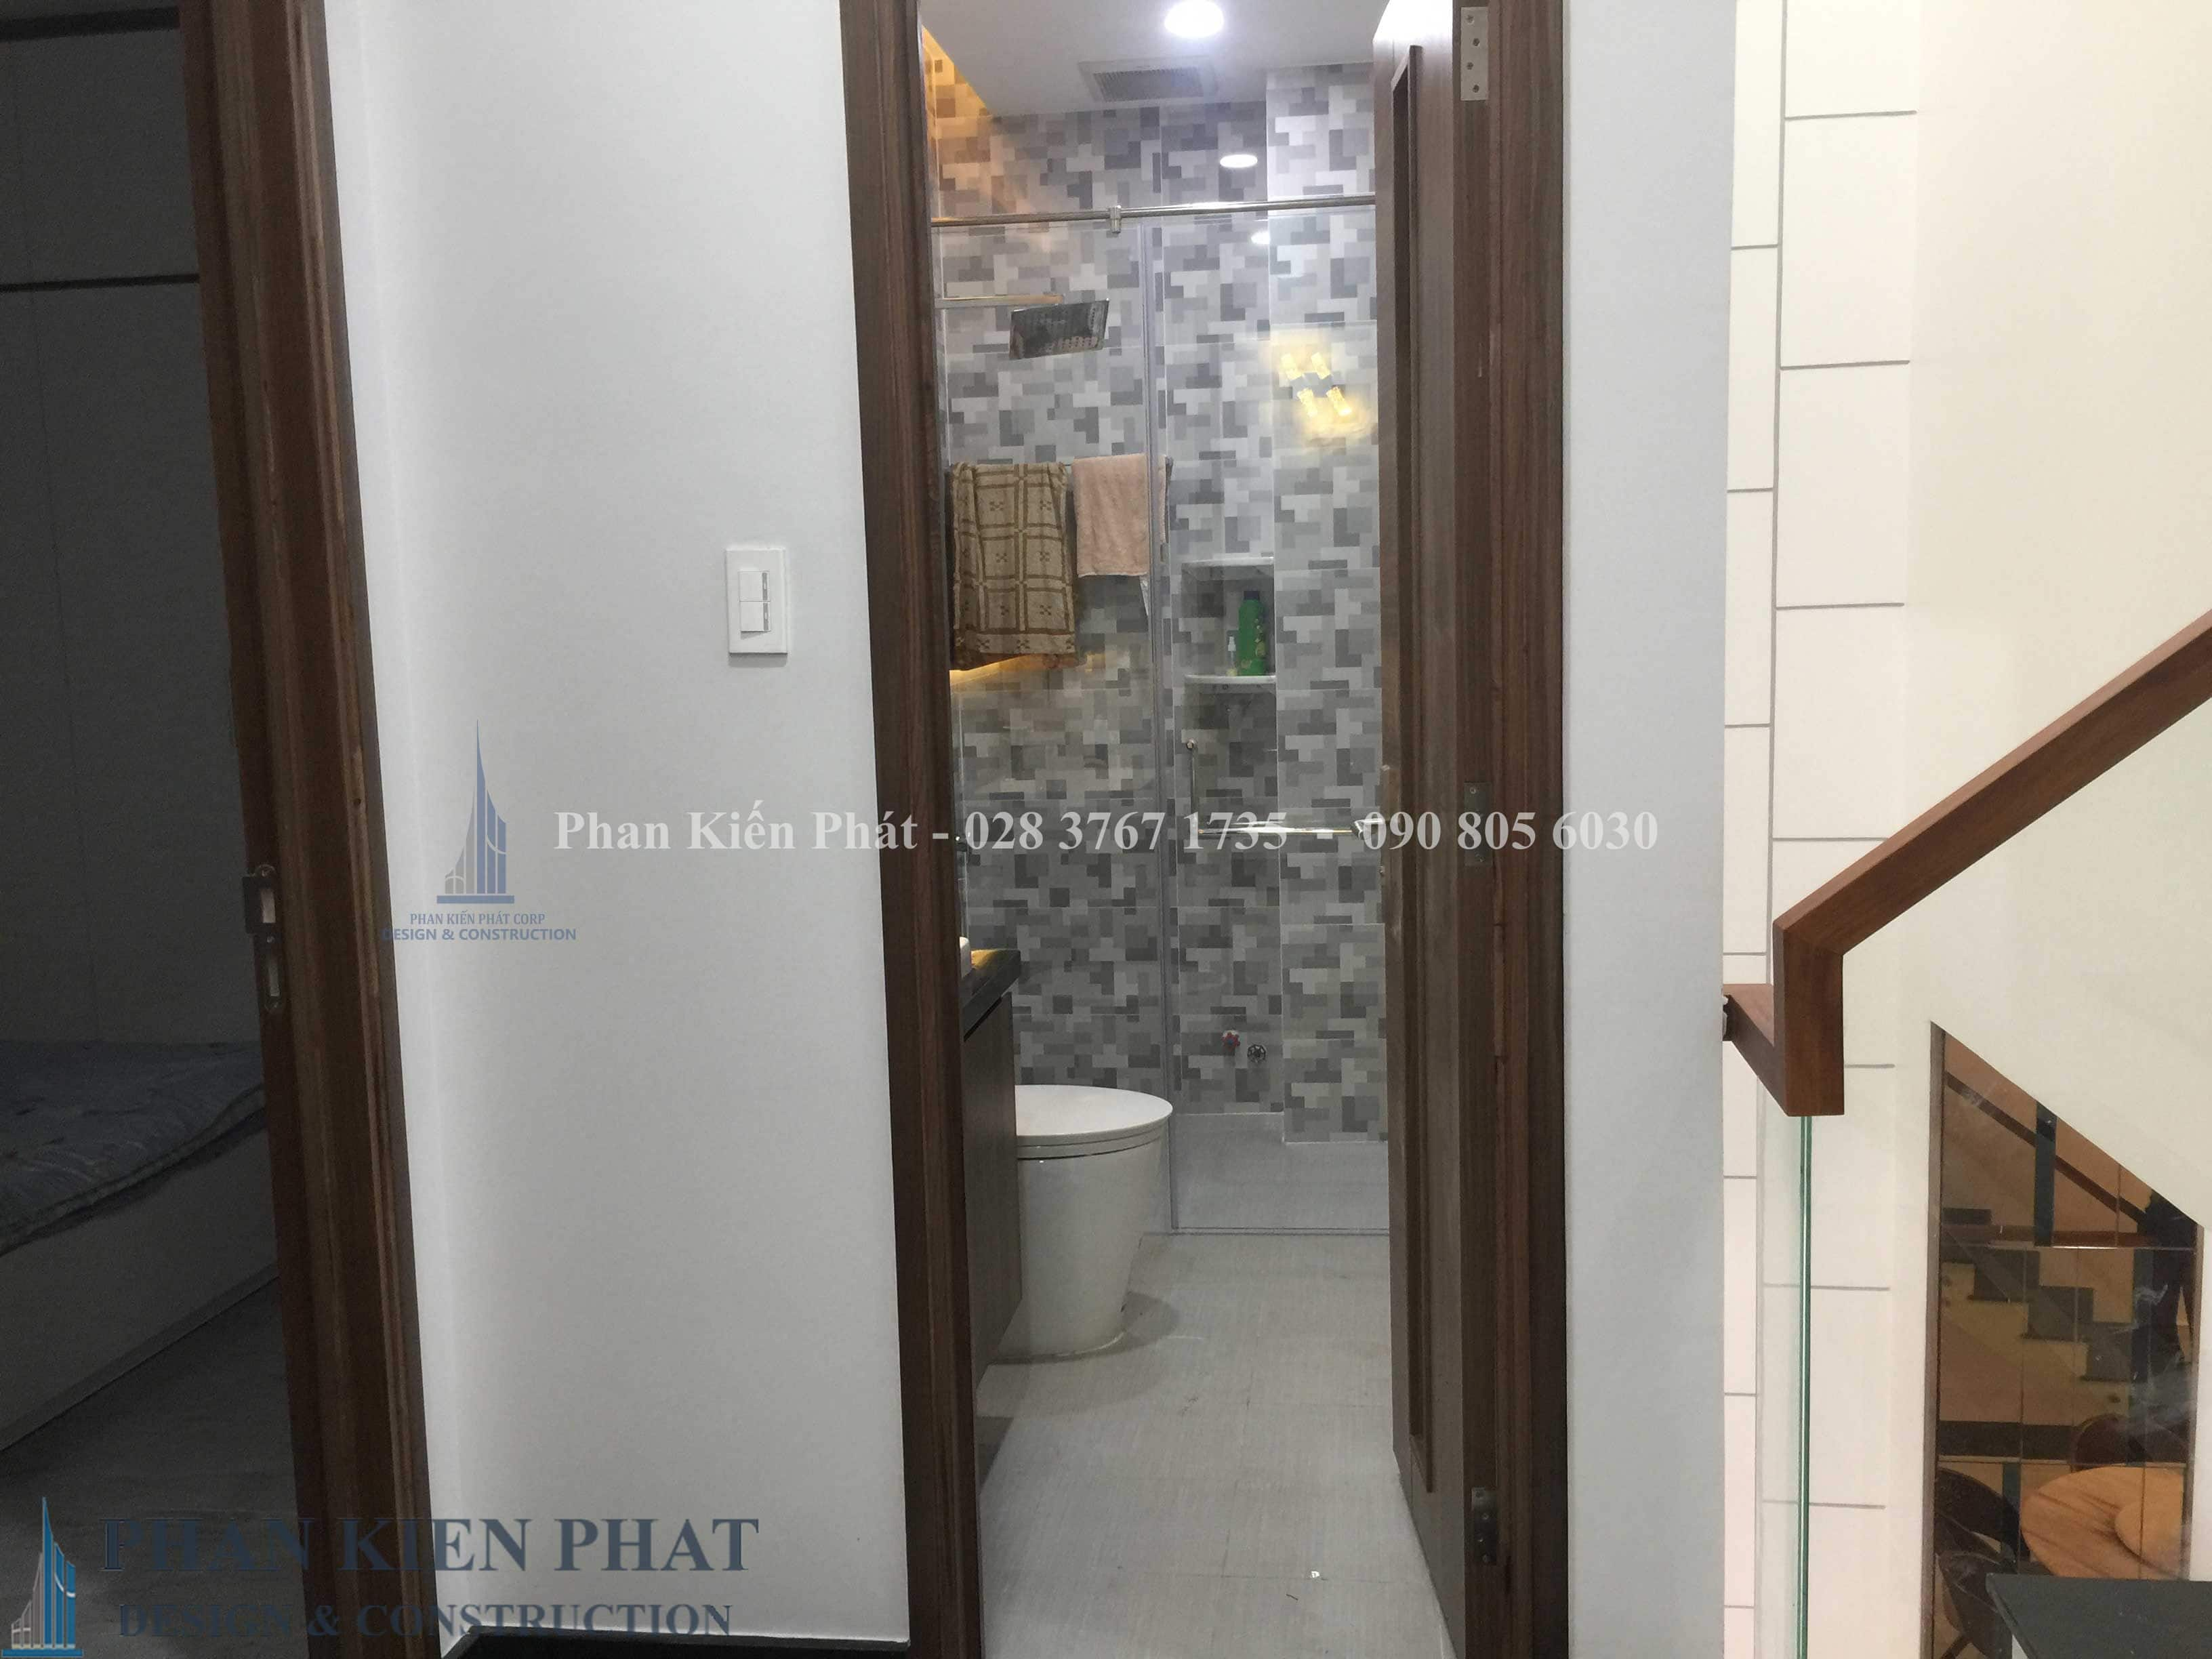 Hoan Thien Noi That Phong Ve Sinh Lau 2 - nhà phố lệch tầng